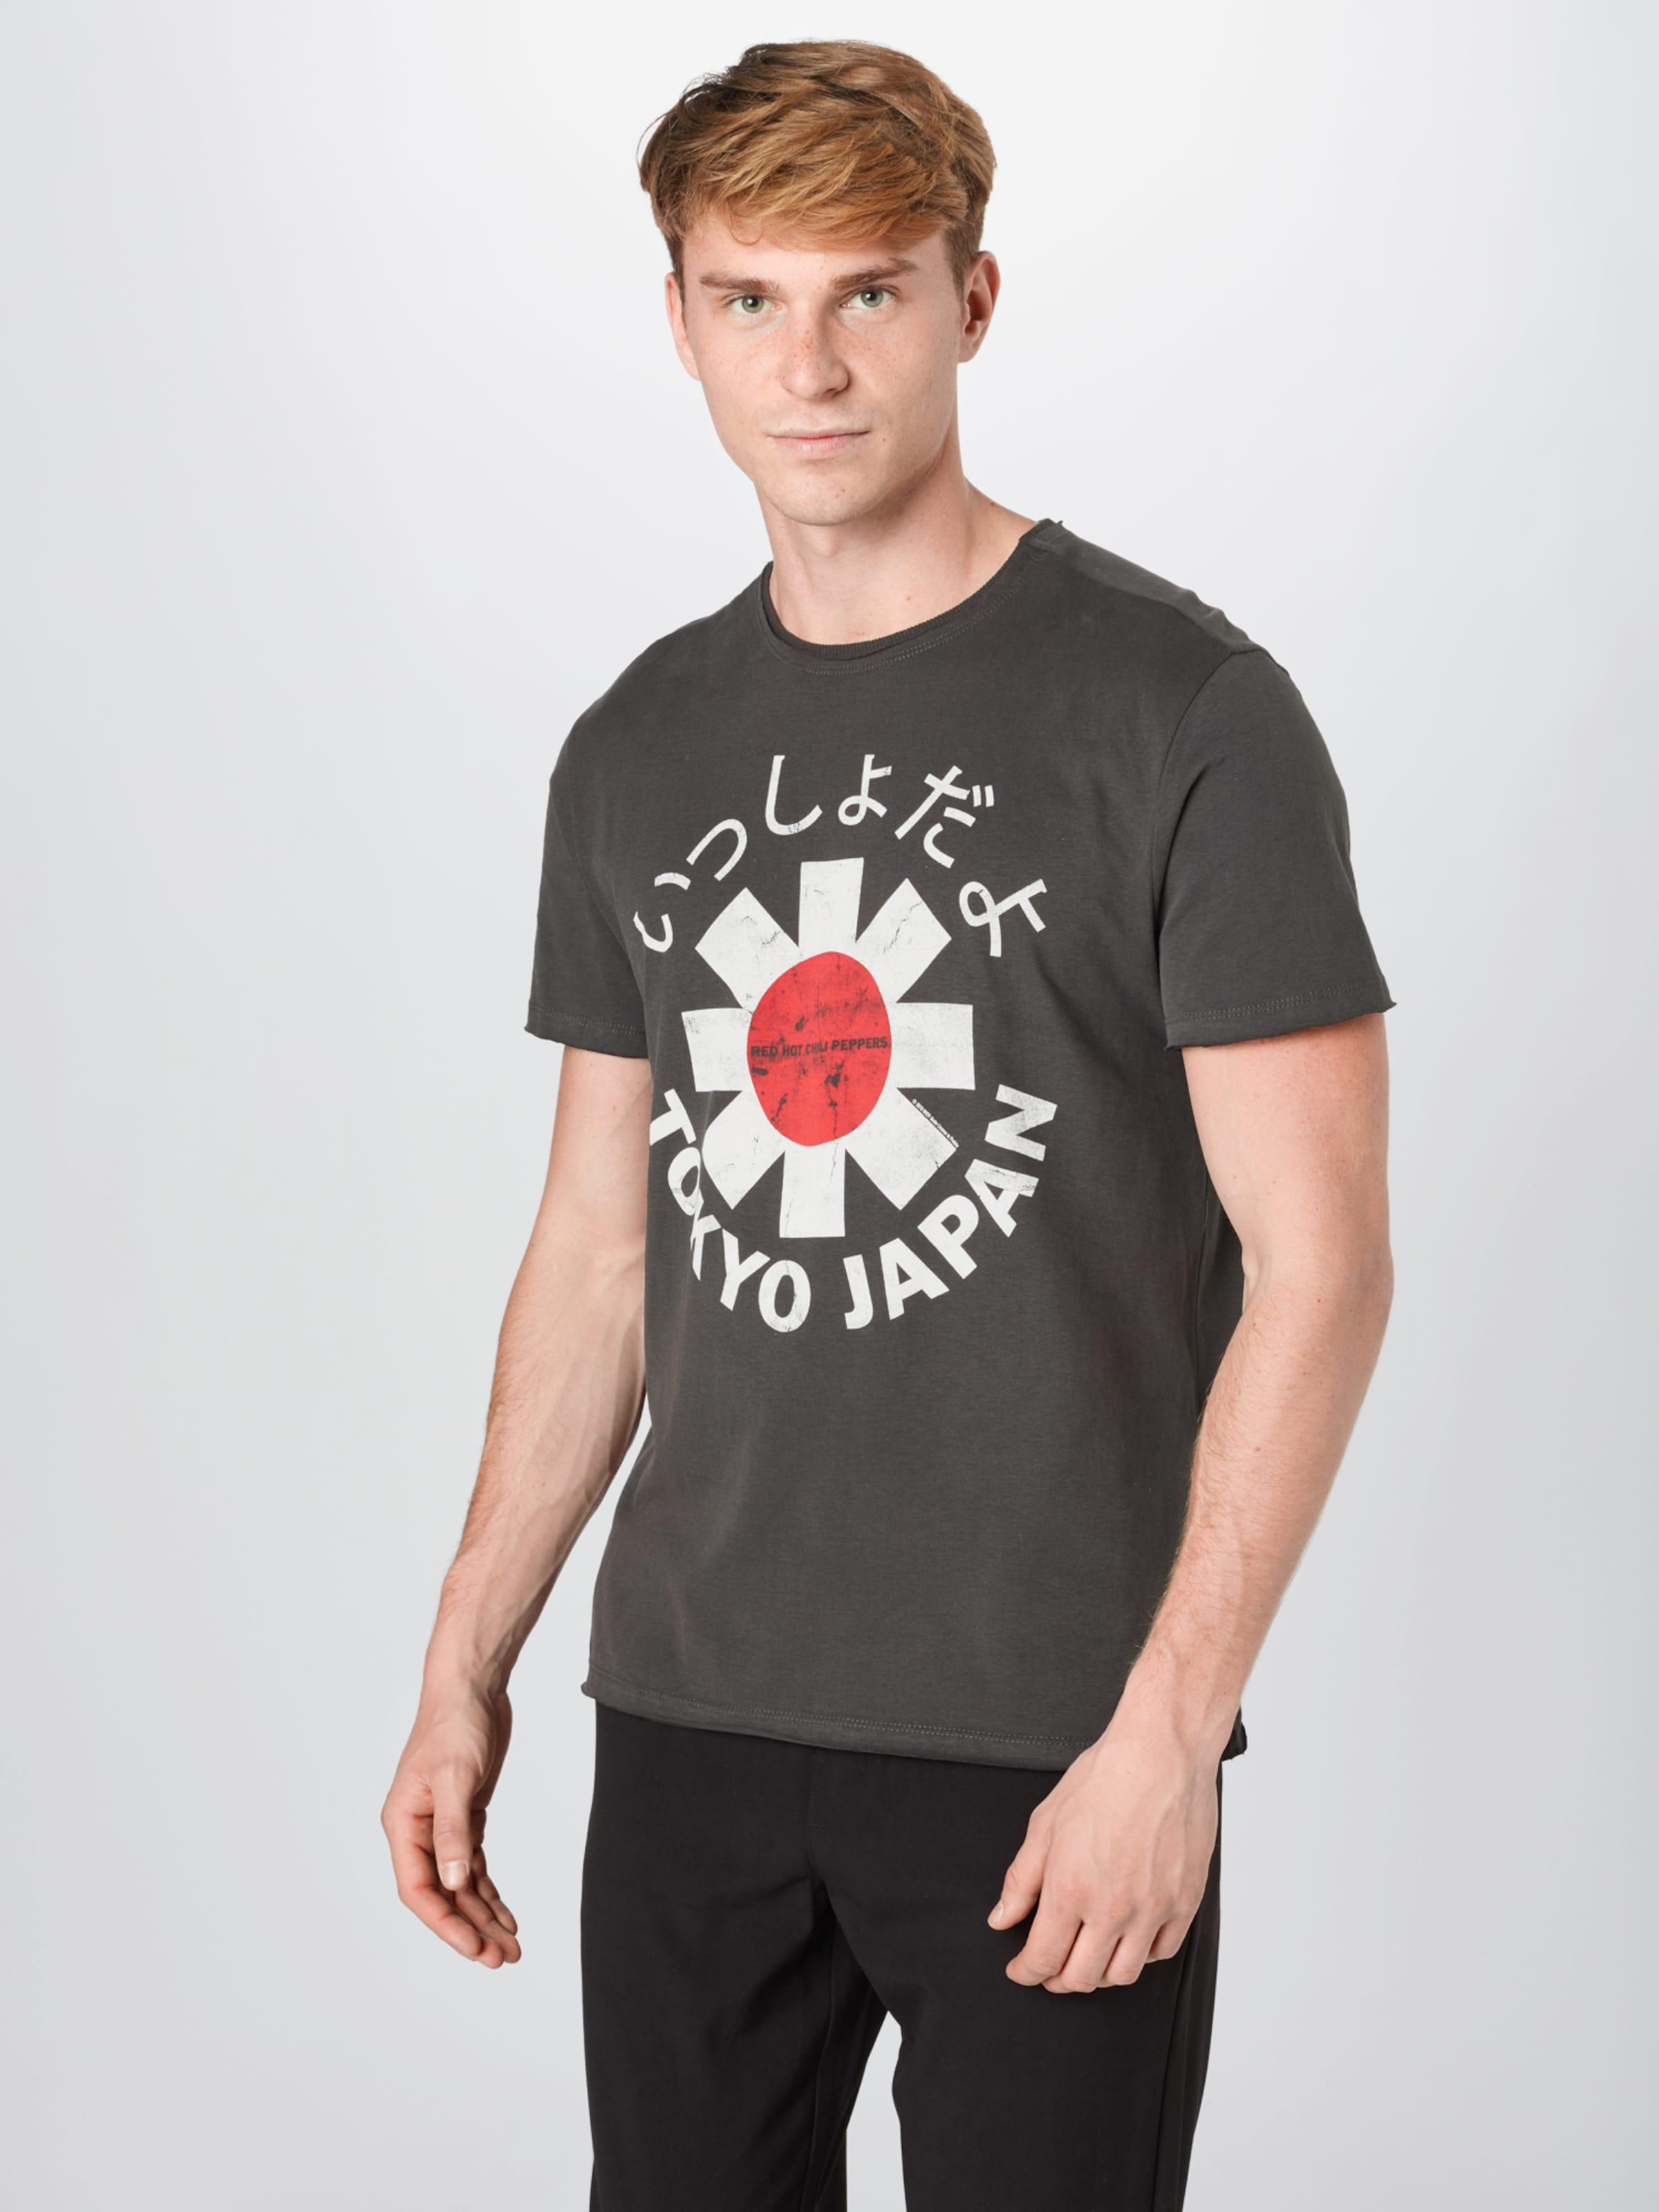 AMPLIFIED T-Shirt 'Tokyo' in dunkelgrau / rot / weiß Jersey AMP0040001000001